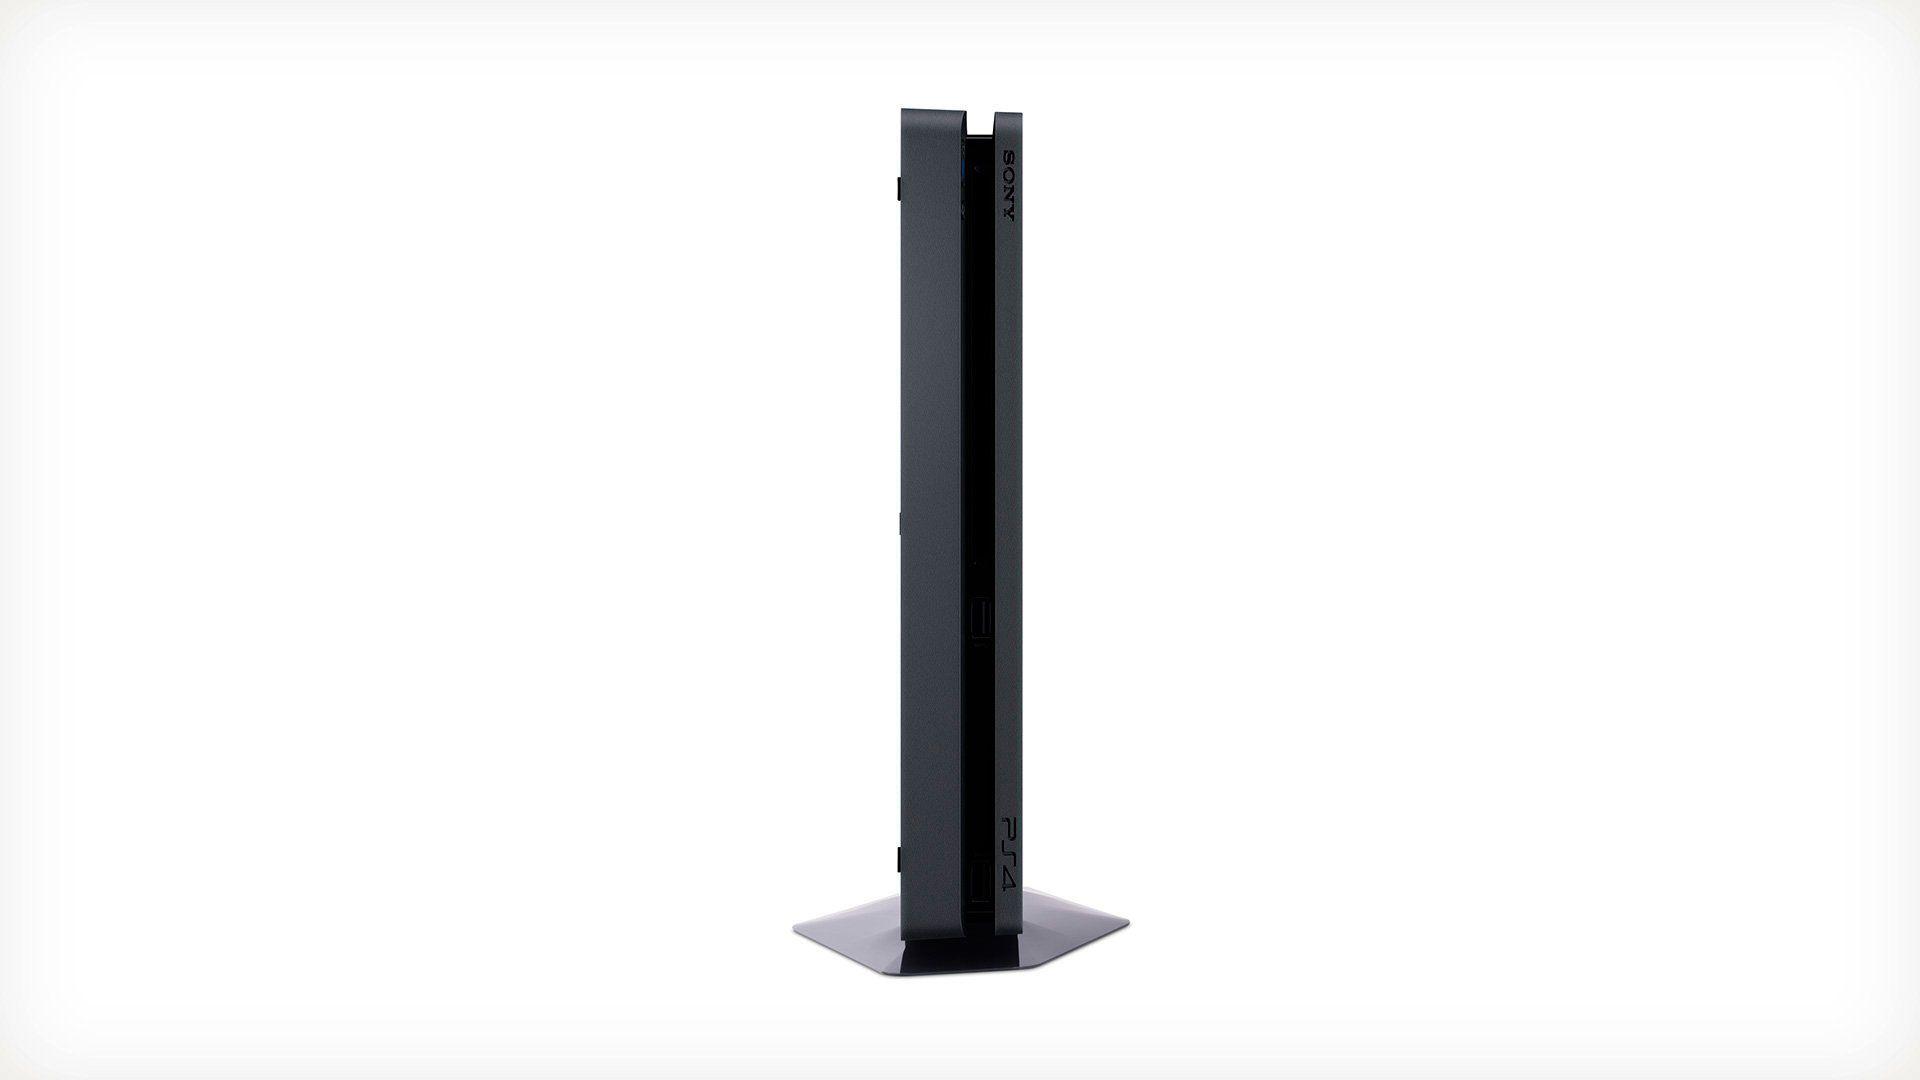 PlayStation 4 Slim 1Tb FIFA 17 и 2 джойстика изображение 5